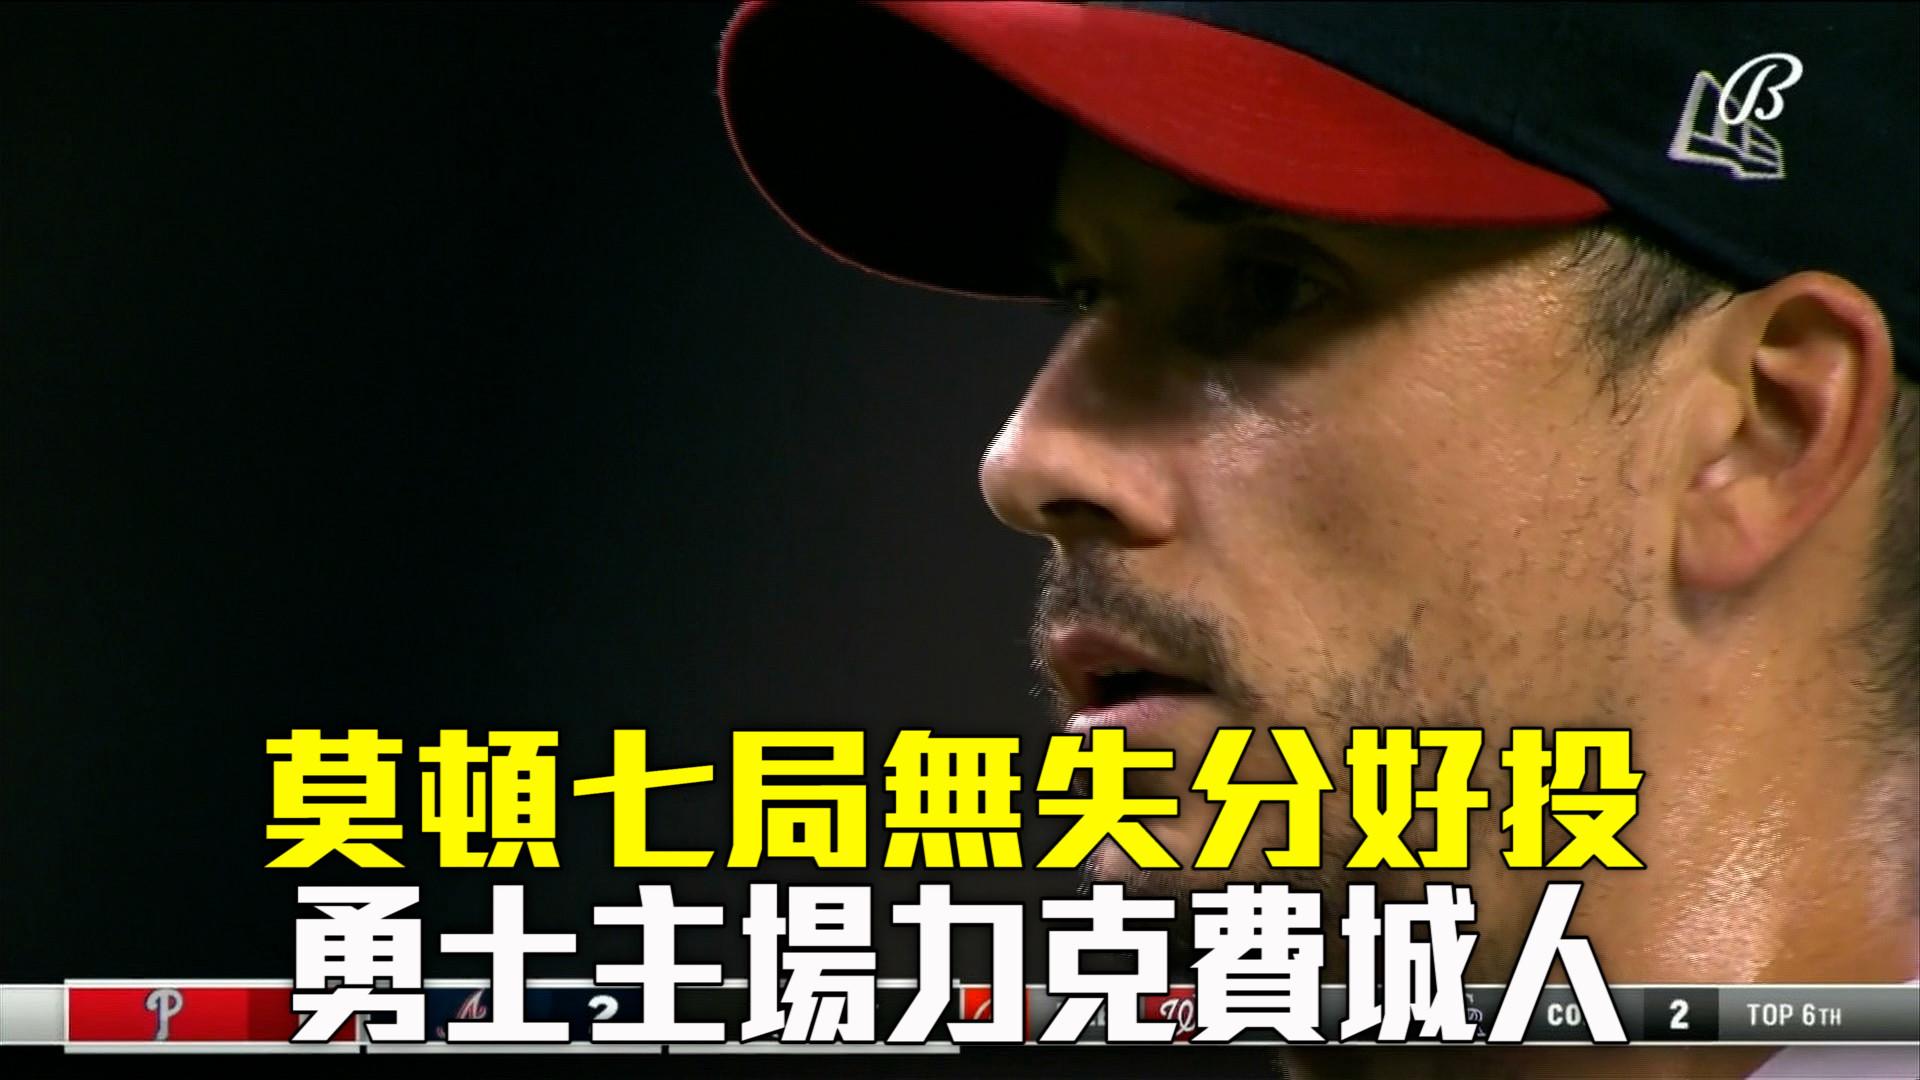 【MLB看愛爾達】莫頓先發七局無失分 勇士力克費城人 9/29